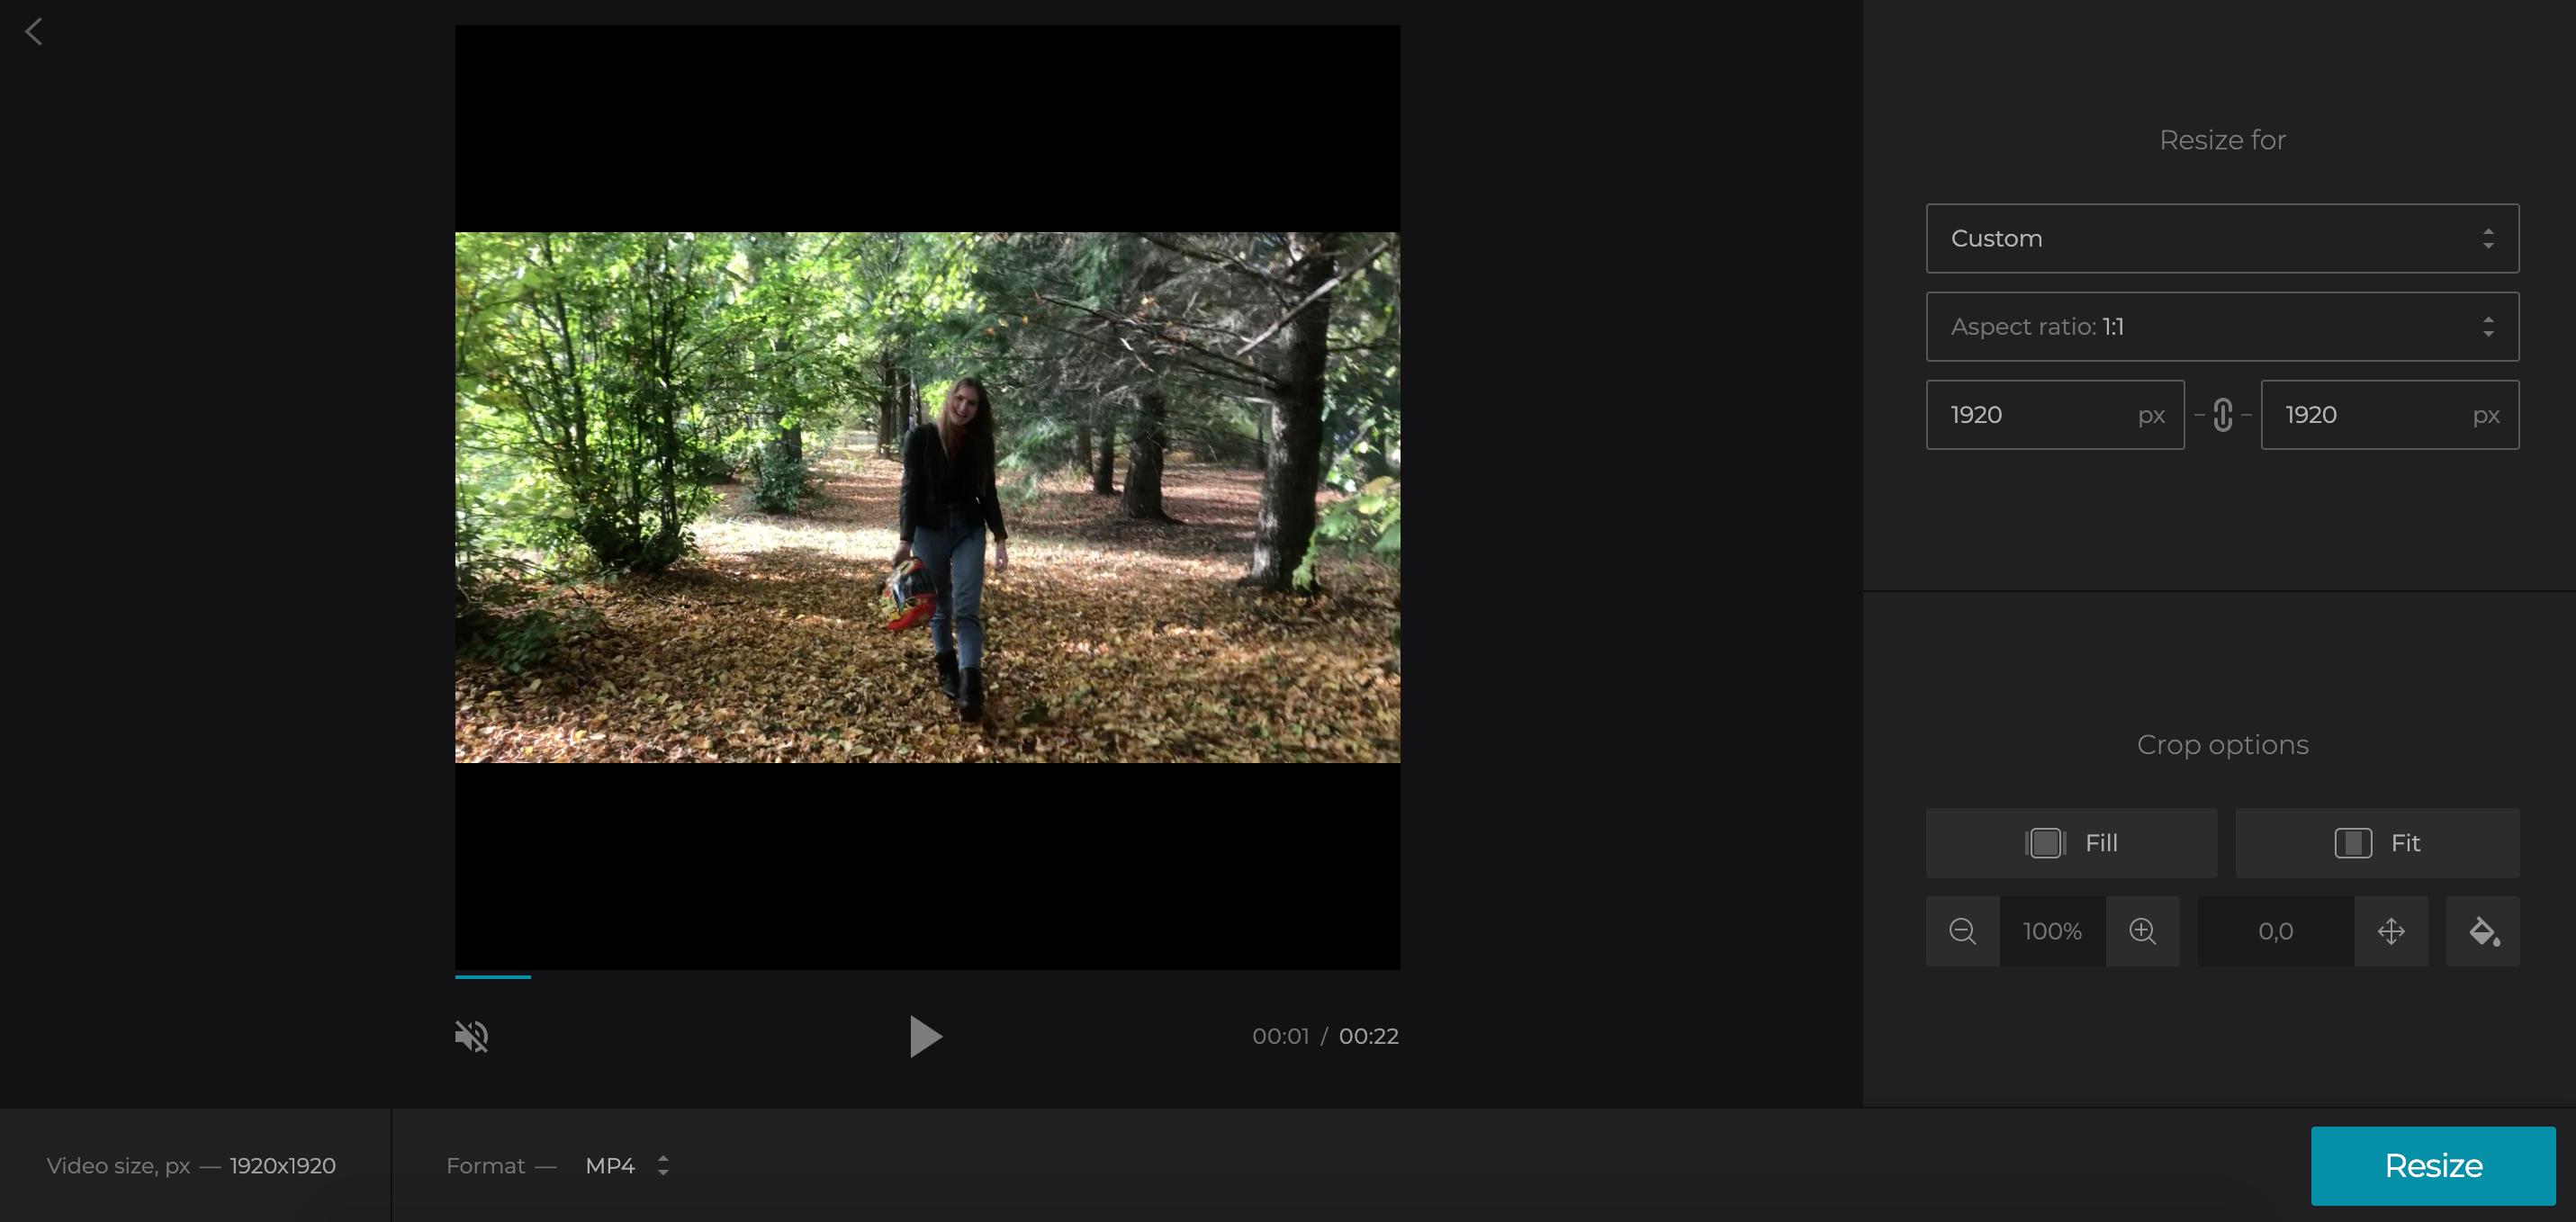 Select Custom preset for Vimeo video